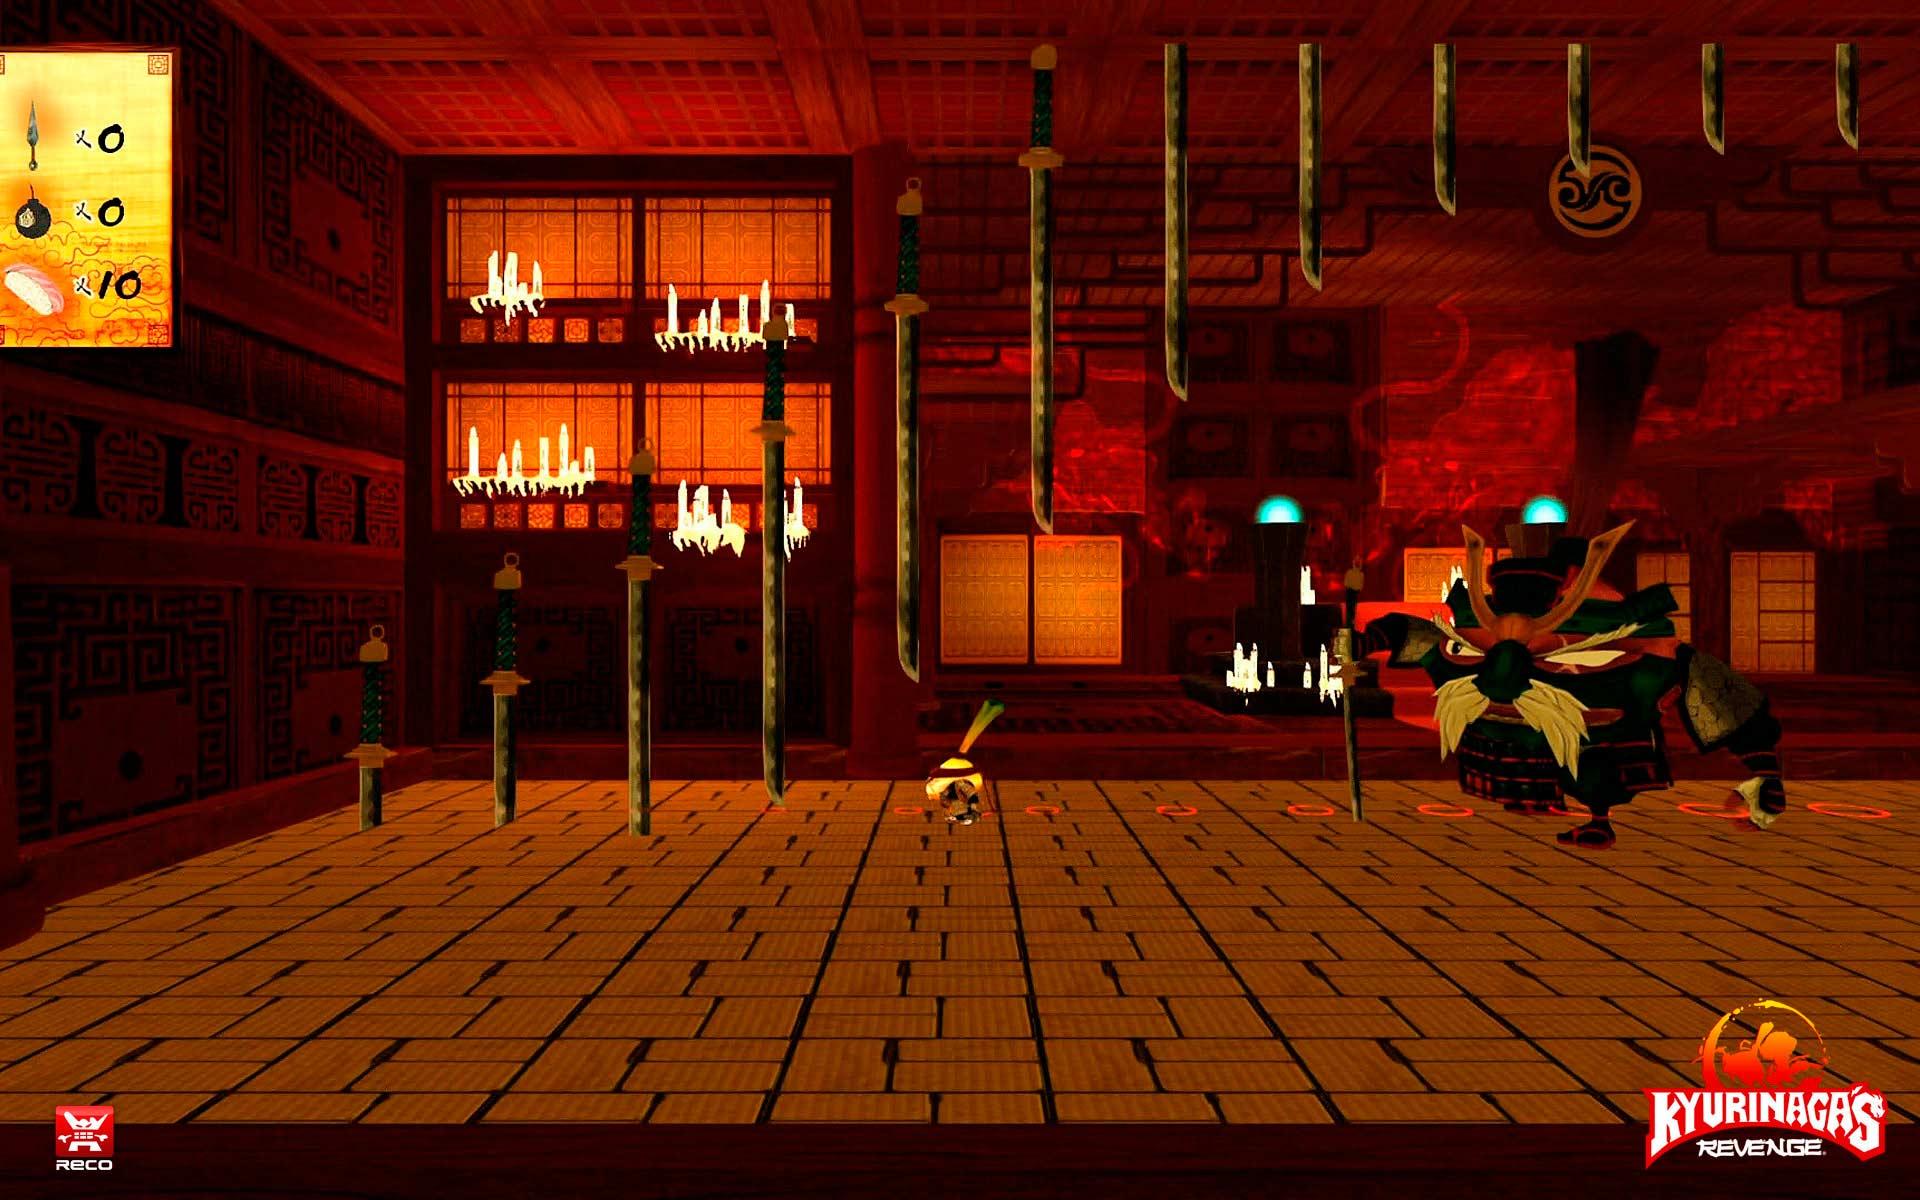 Kyurinaga's Revenge screens 4